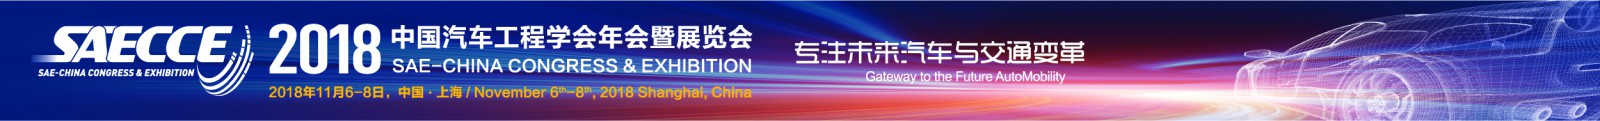 2018188bet备用年会暨展览会